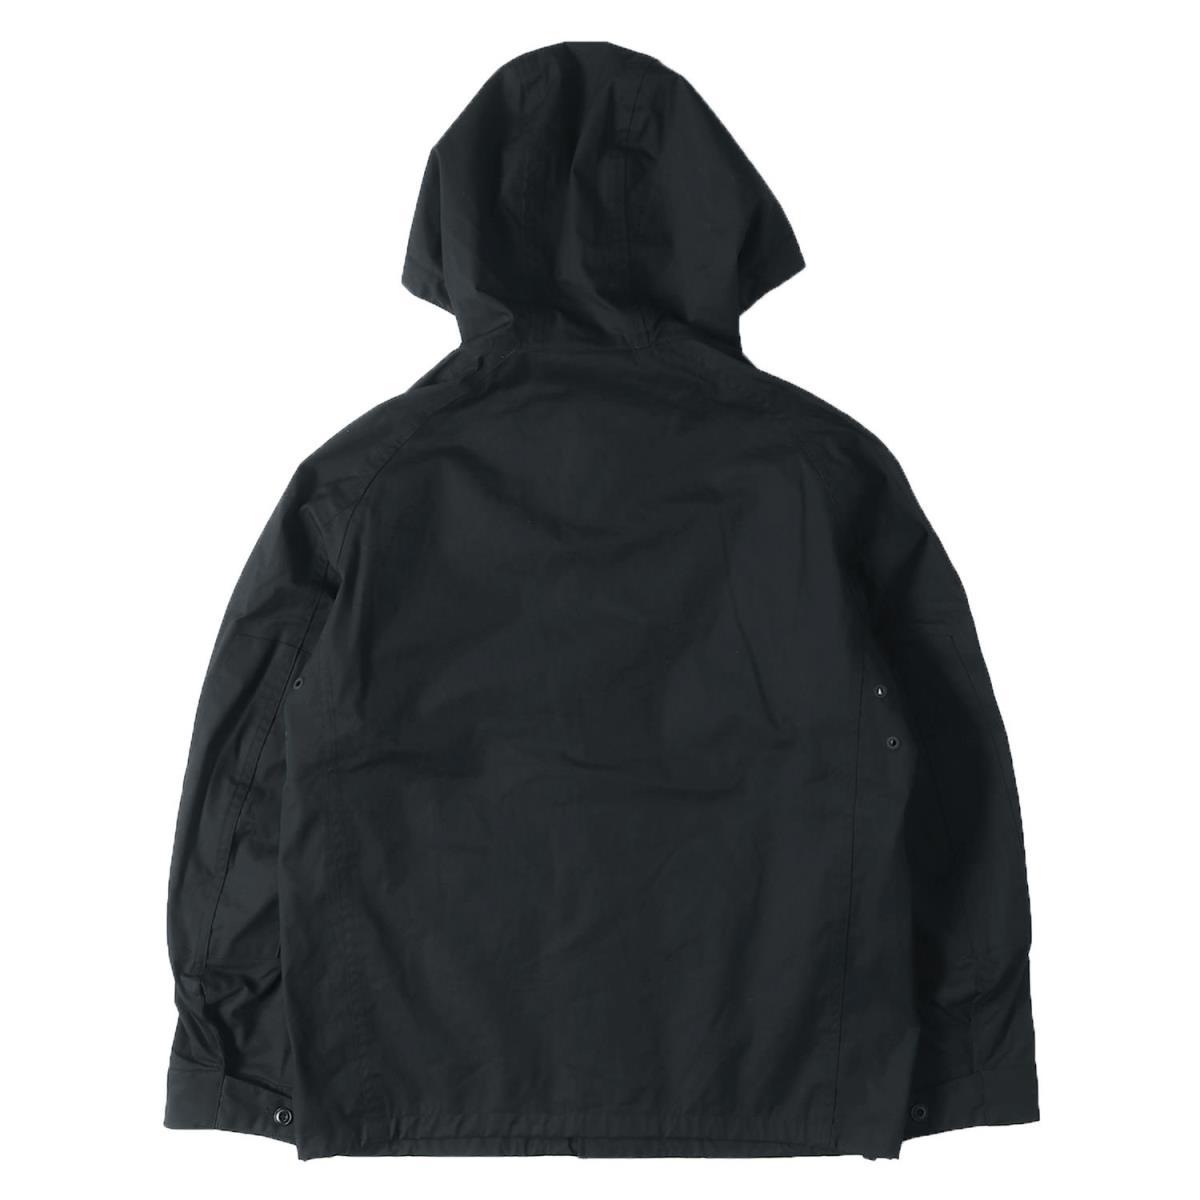 7650ac73 ... CHRISTOPHE LEMAIRE (Christoph Lemerre) X UNIQLO hooded cotton field jacket  black M ...